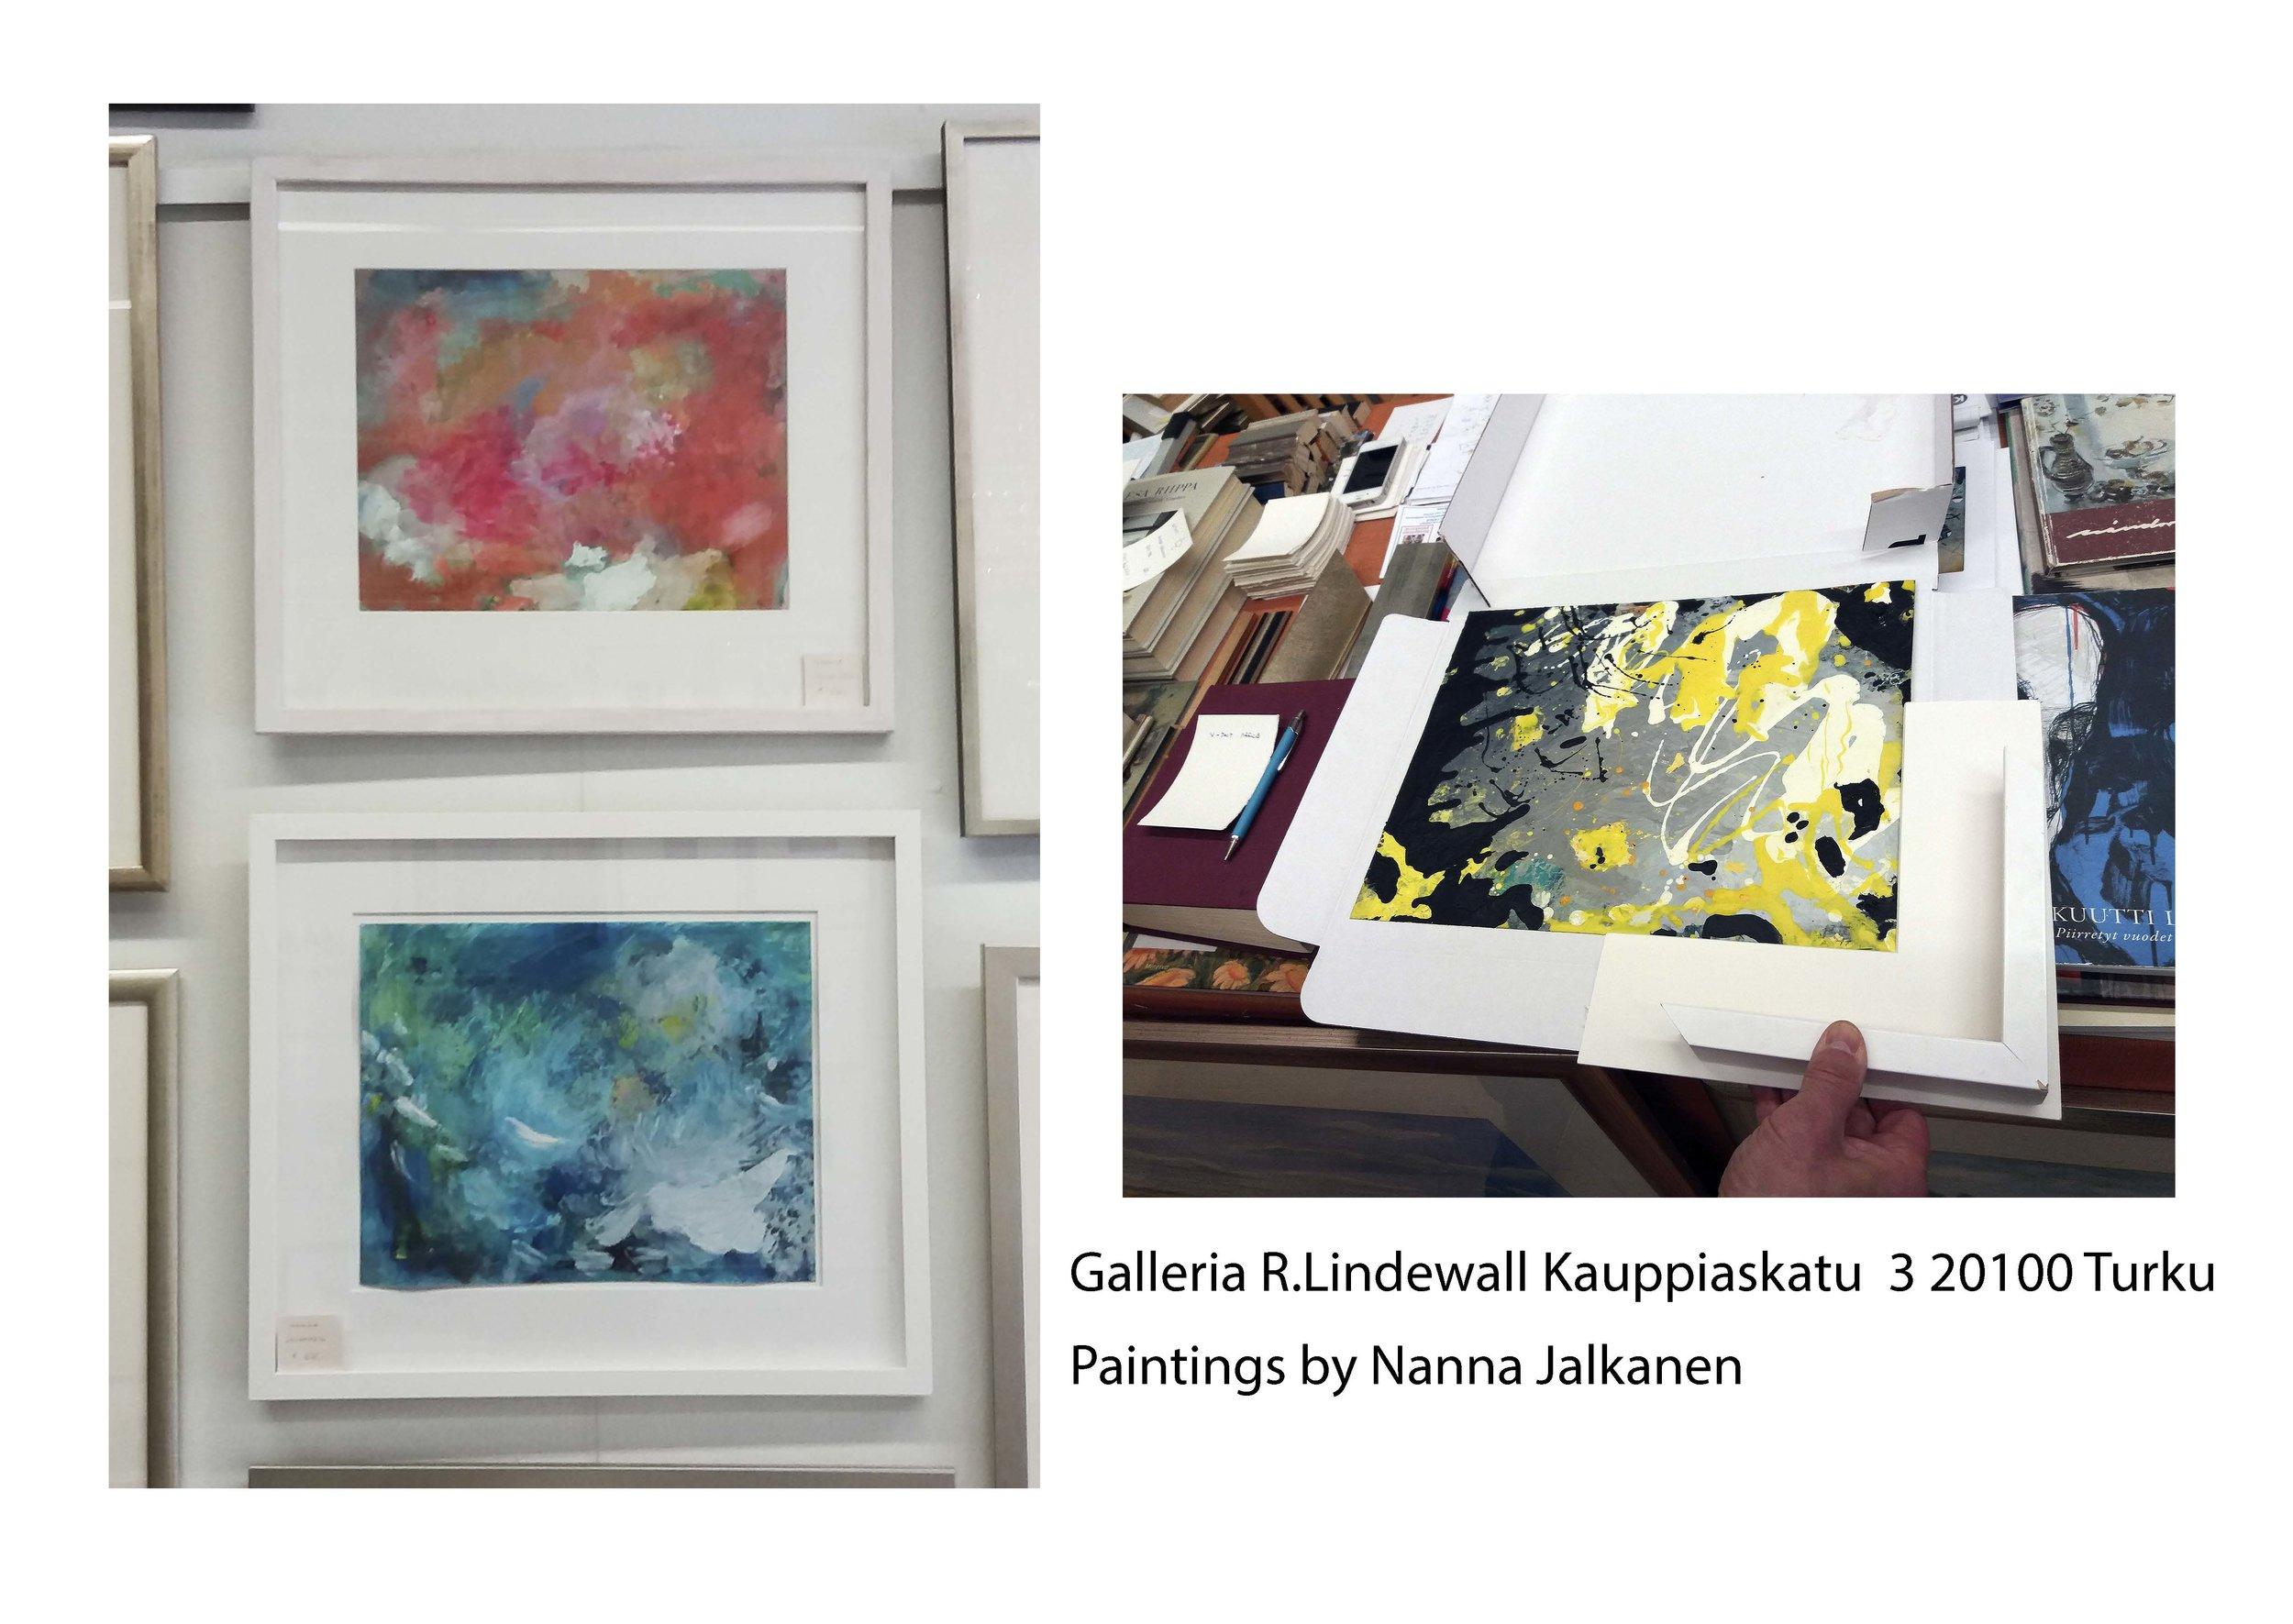 Gallery and framer R.Lindewall  in turku